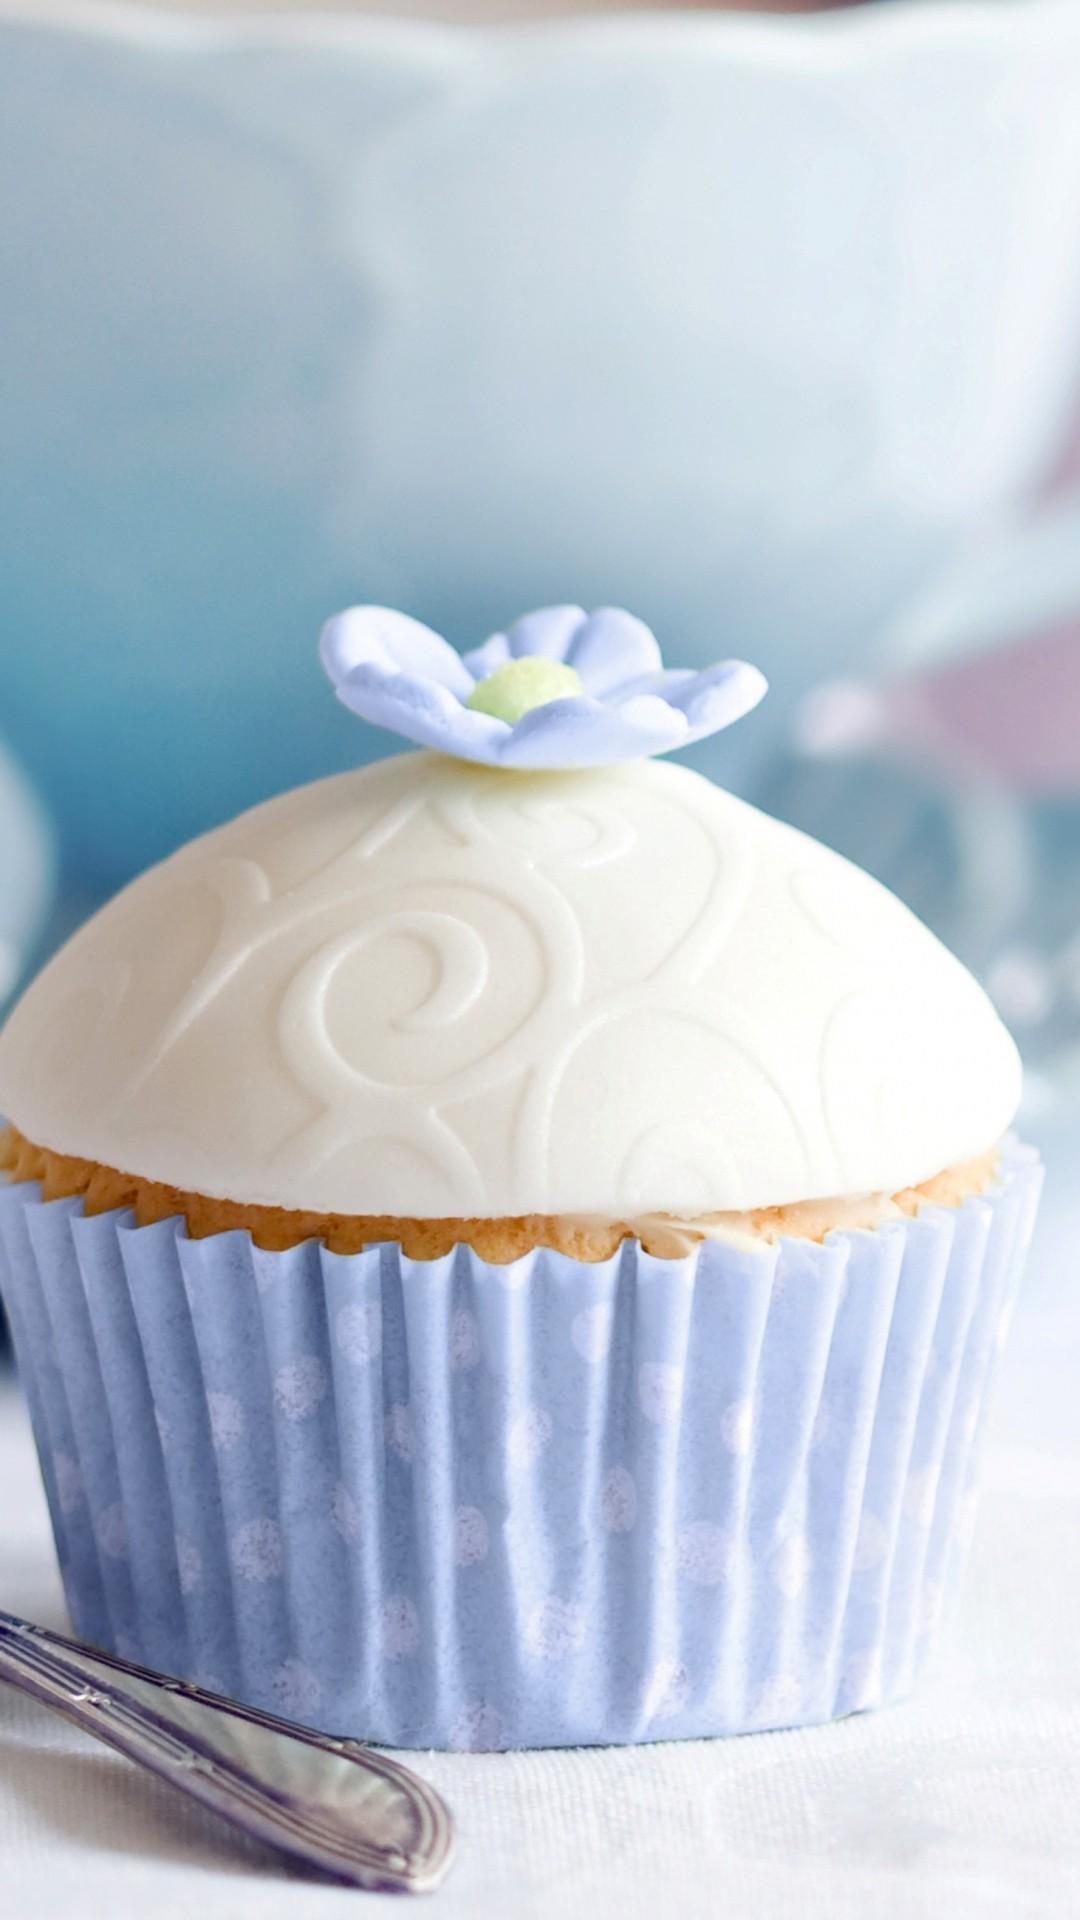 Res: 1080x1920, ... Cupcake Cake Fork Dessert iPhone 8 wallpaper.